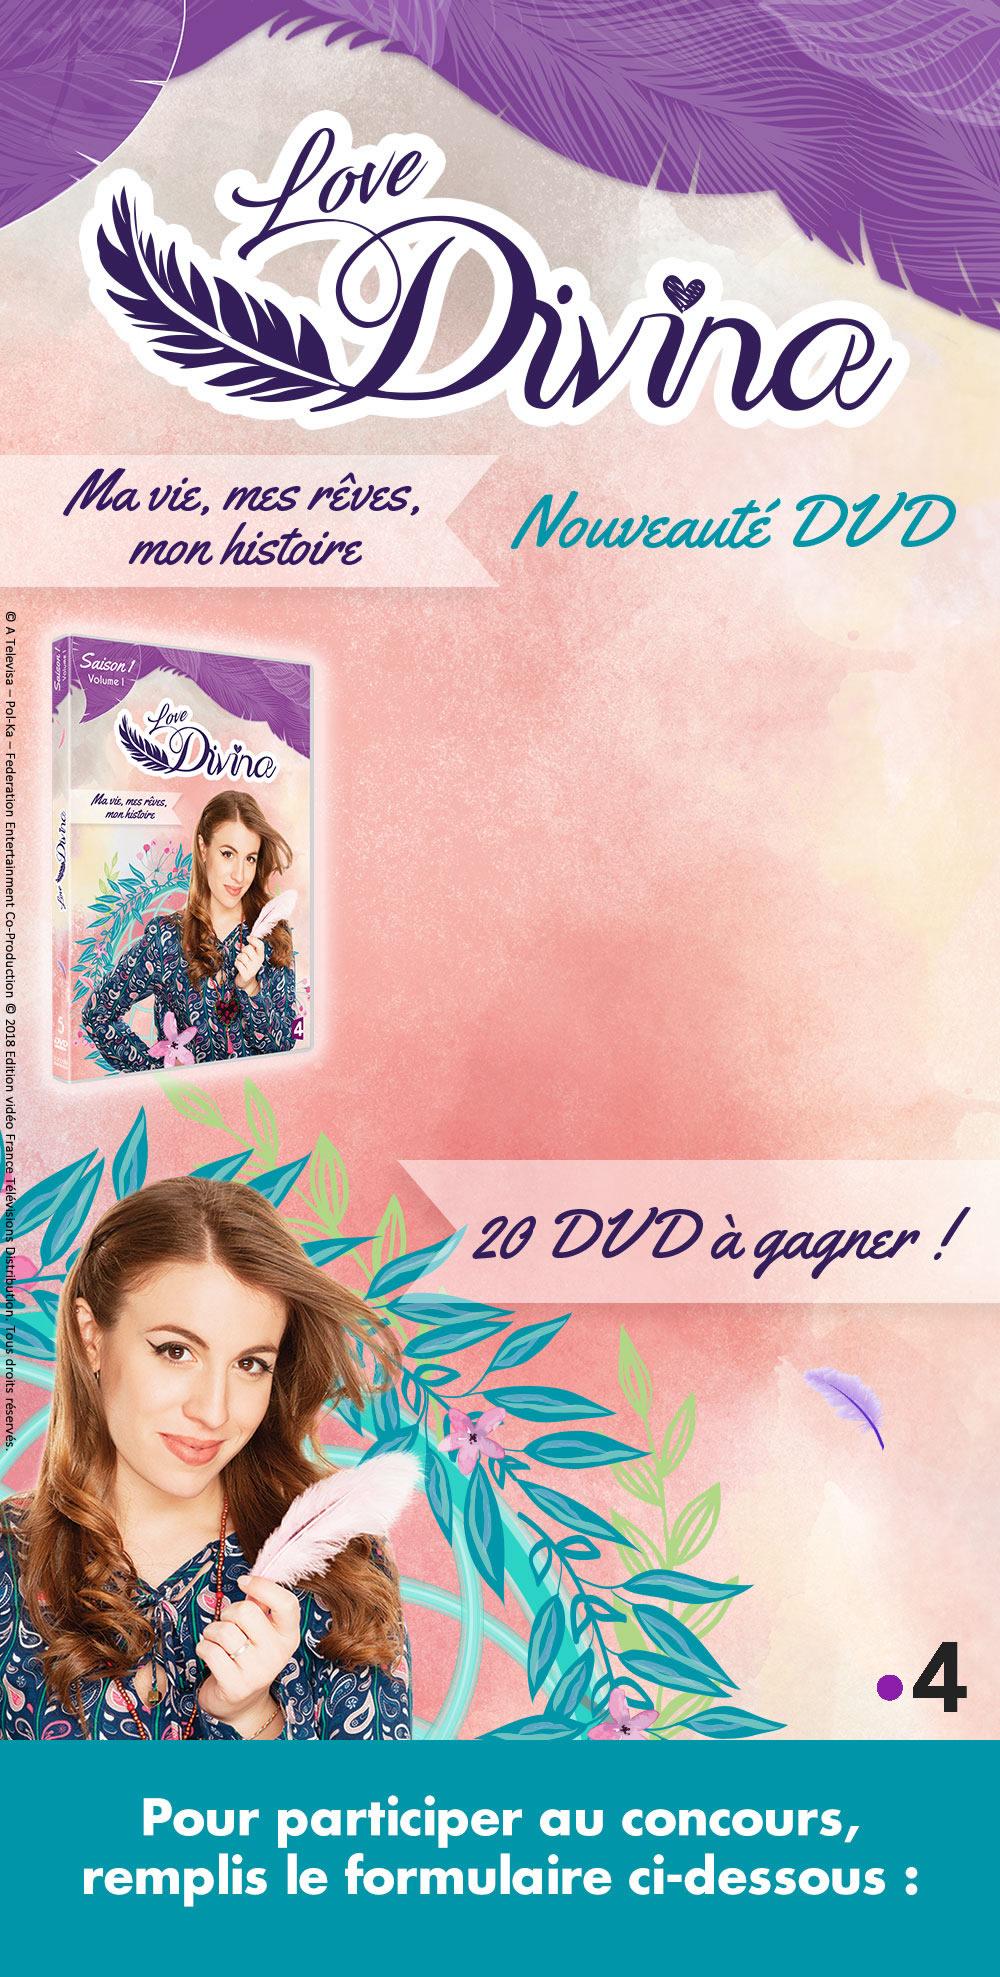 Gagne des DVD de Love Divina !